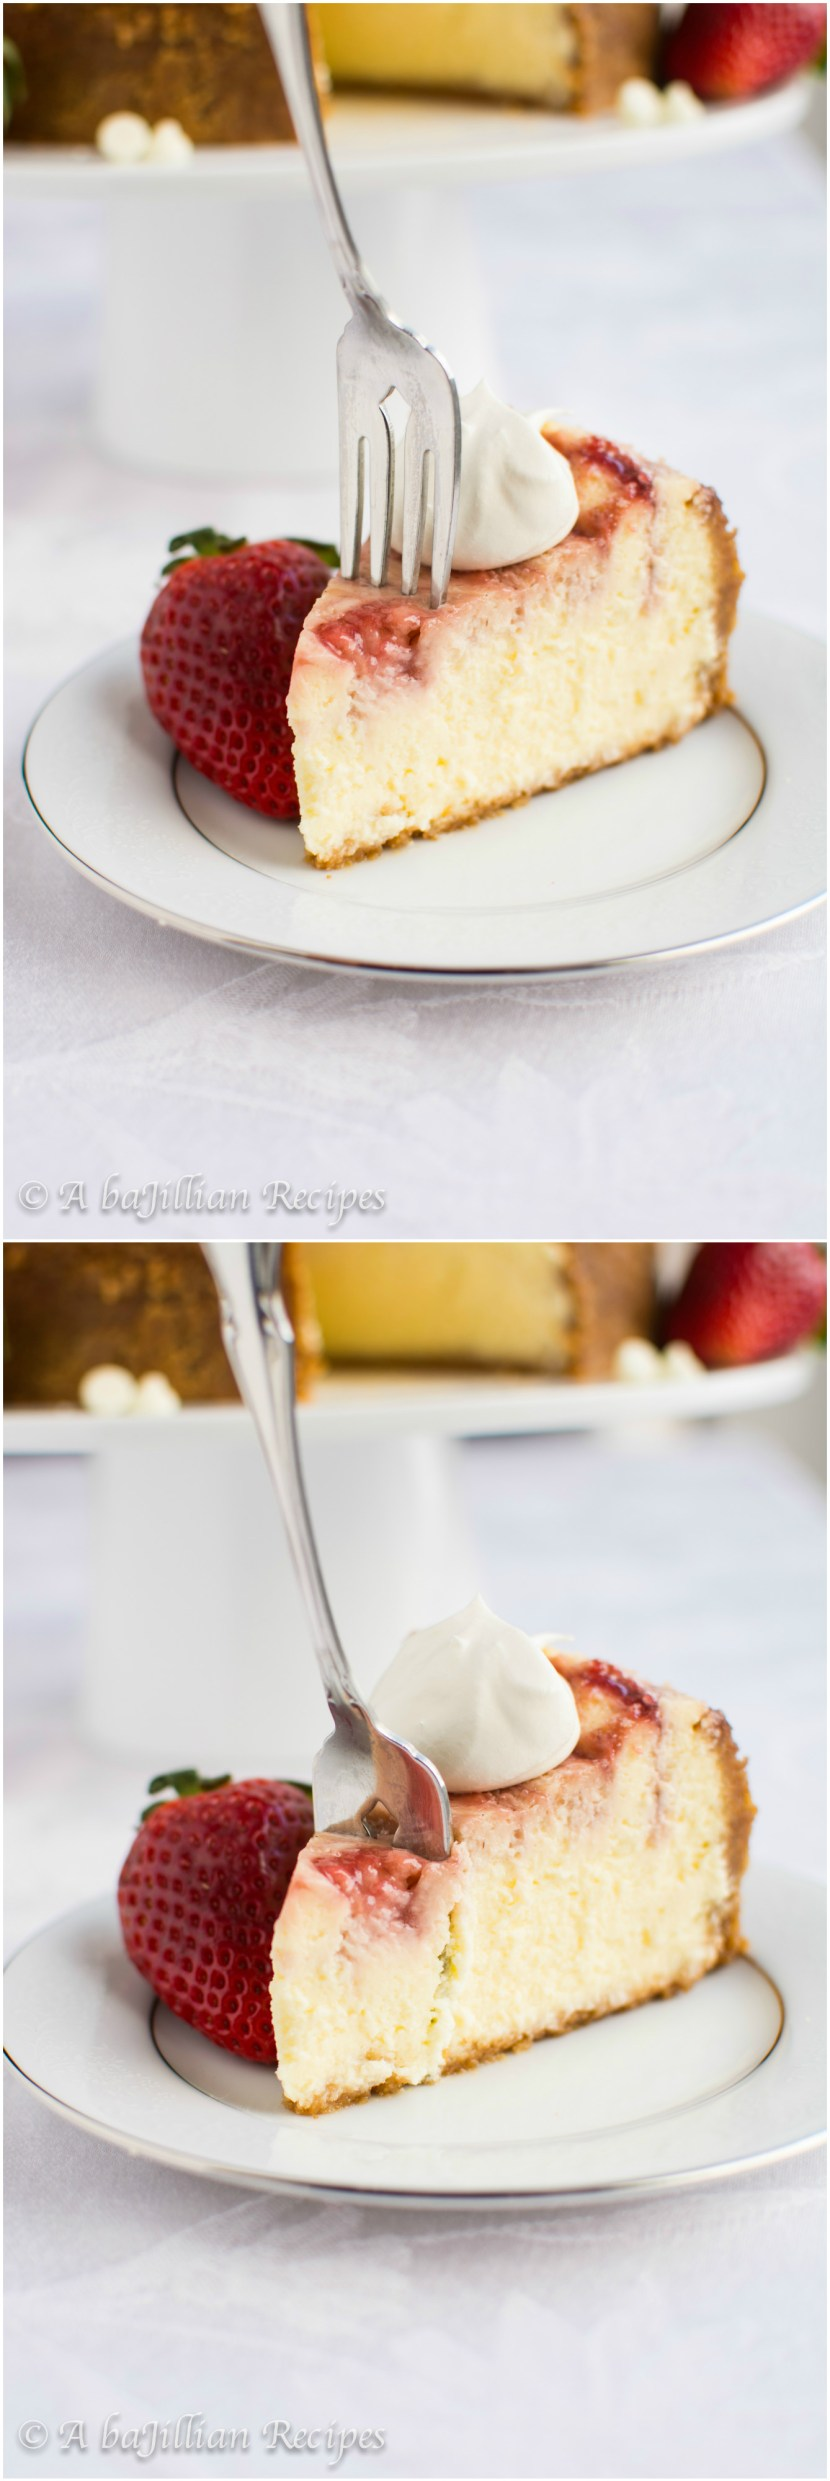 White-Chocolate-Strawberry-Cheesecake-abajillianrecipes.com3